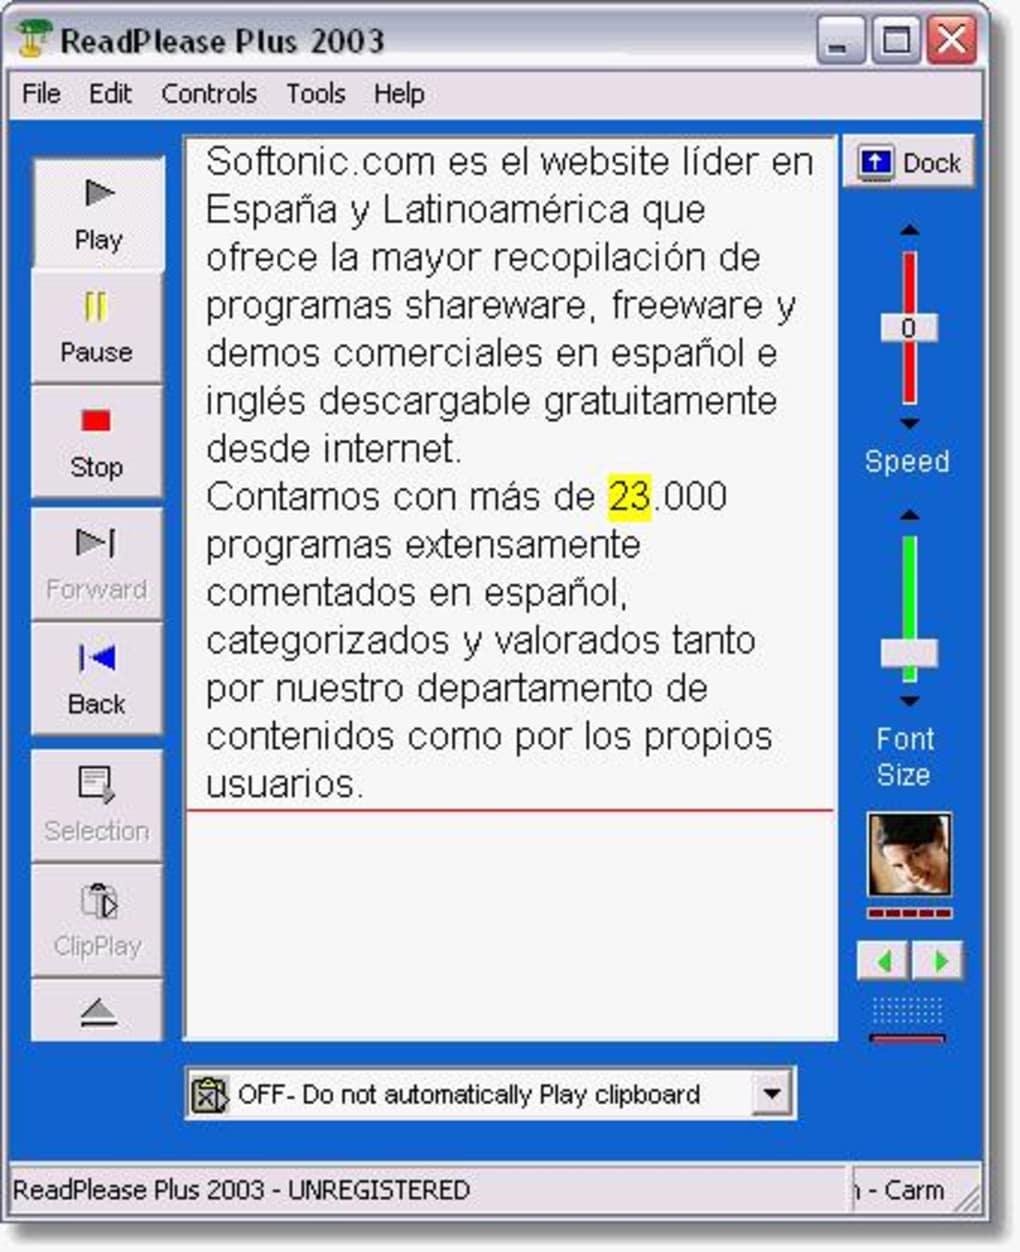 readplease 2003